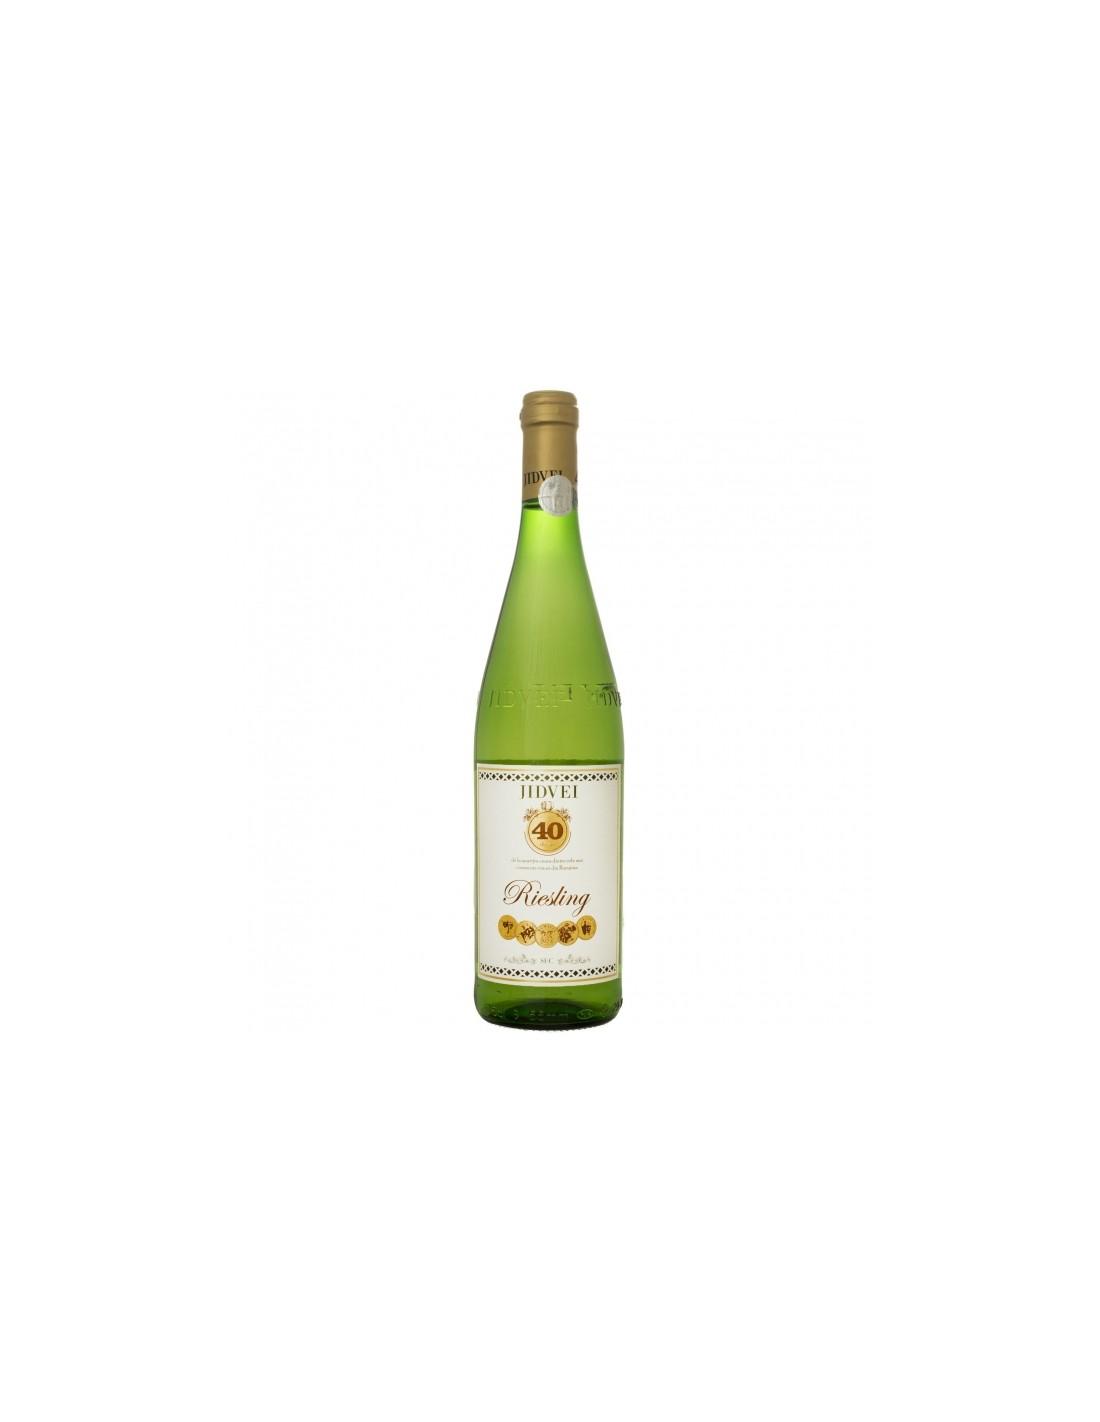 Vin alb sec, Riesling, Jidvei Tarnave, 0.75L, 11% alc., Romania